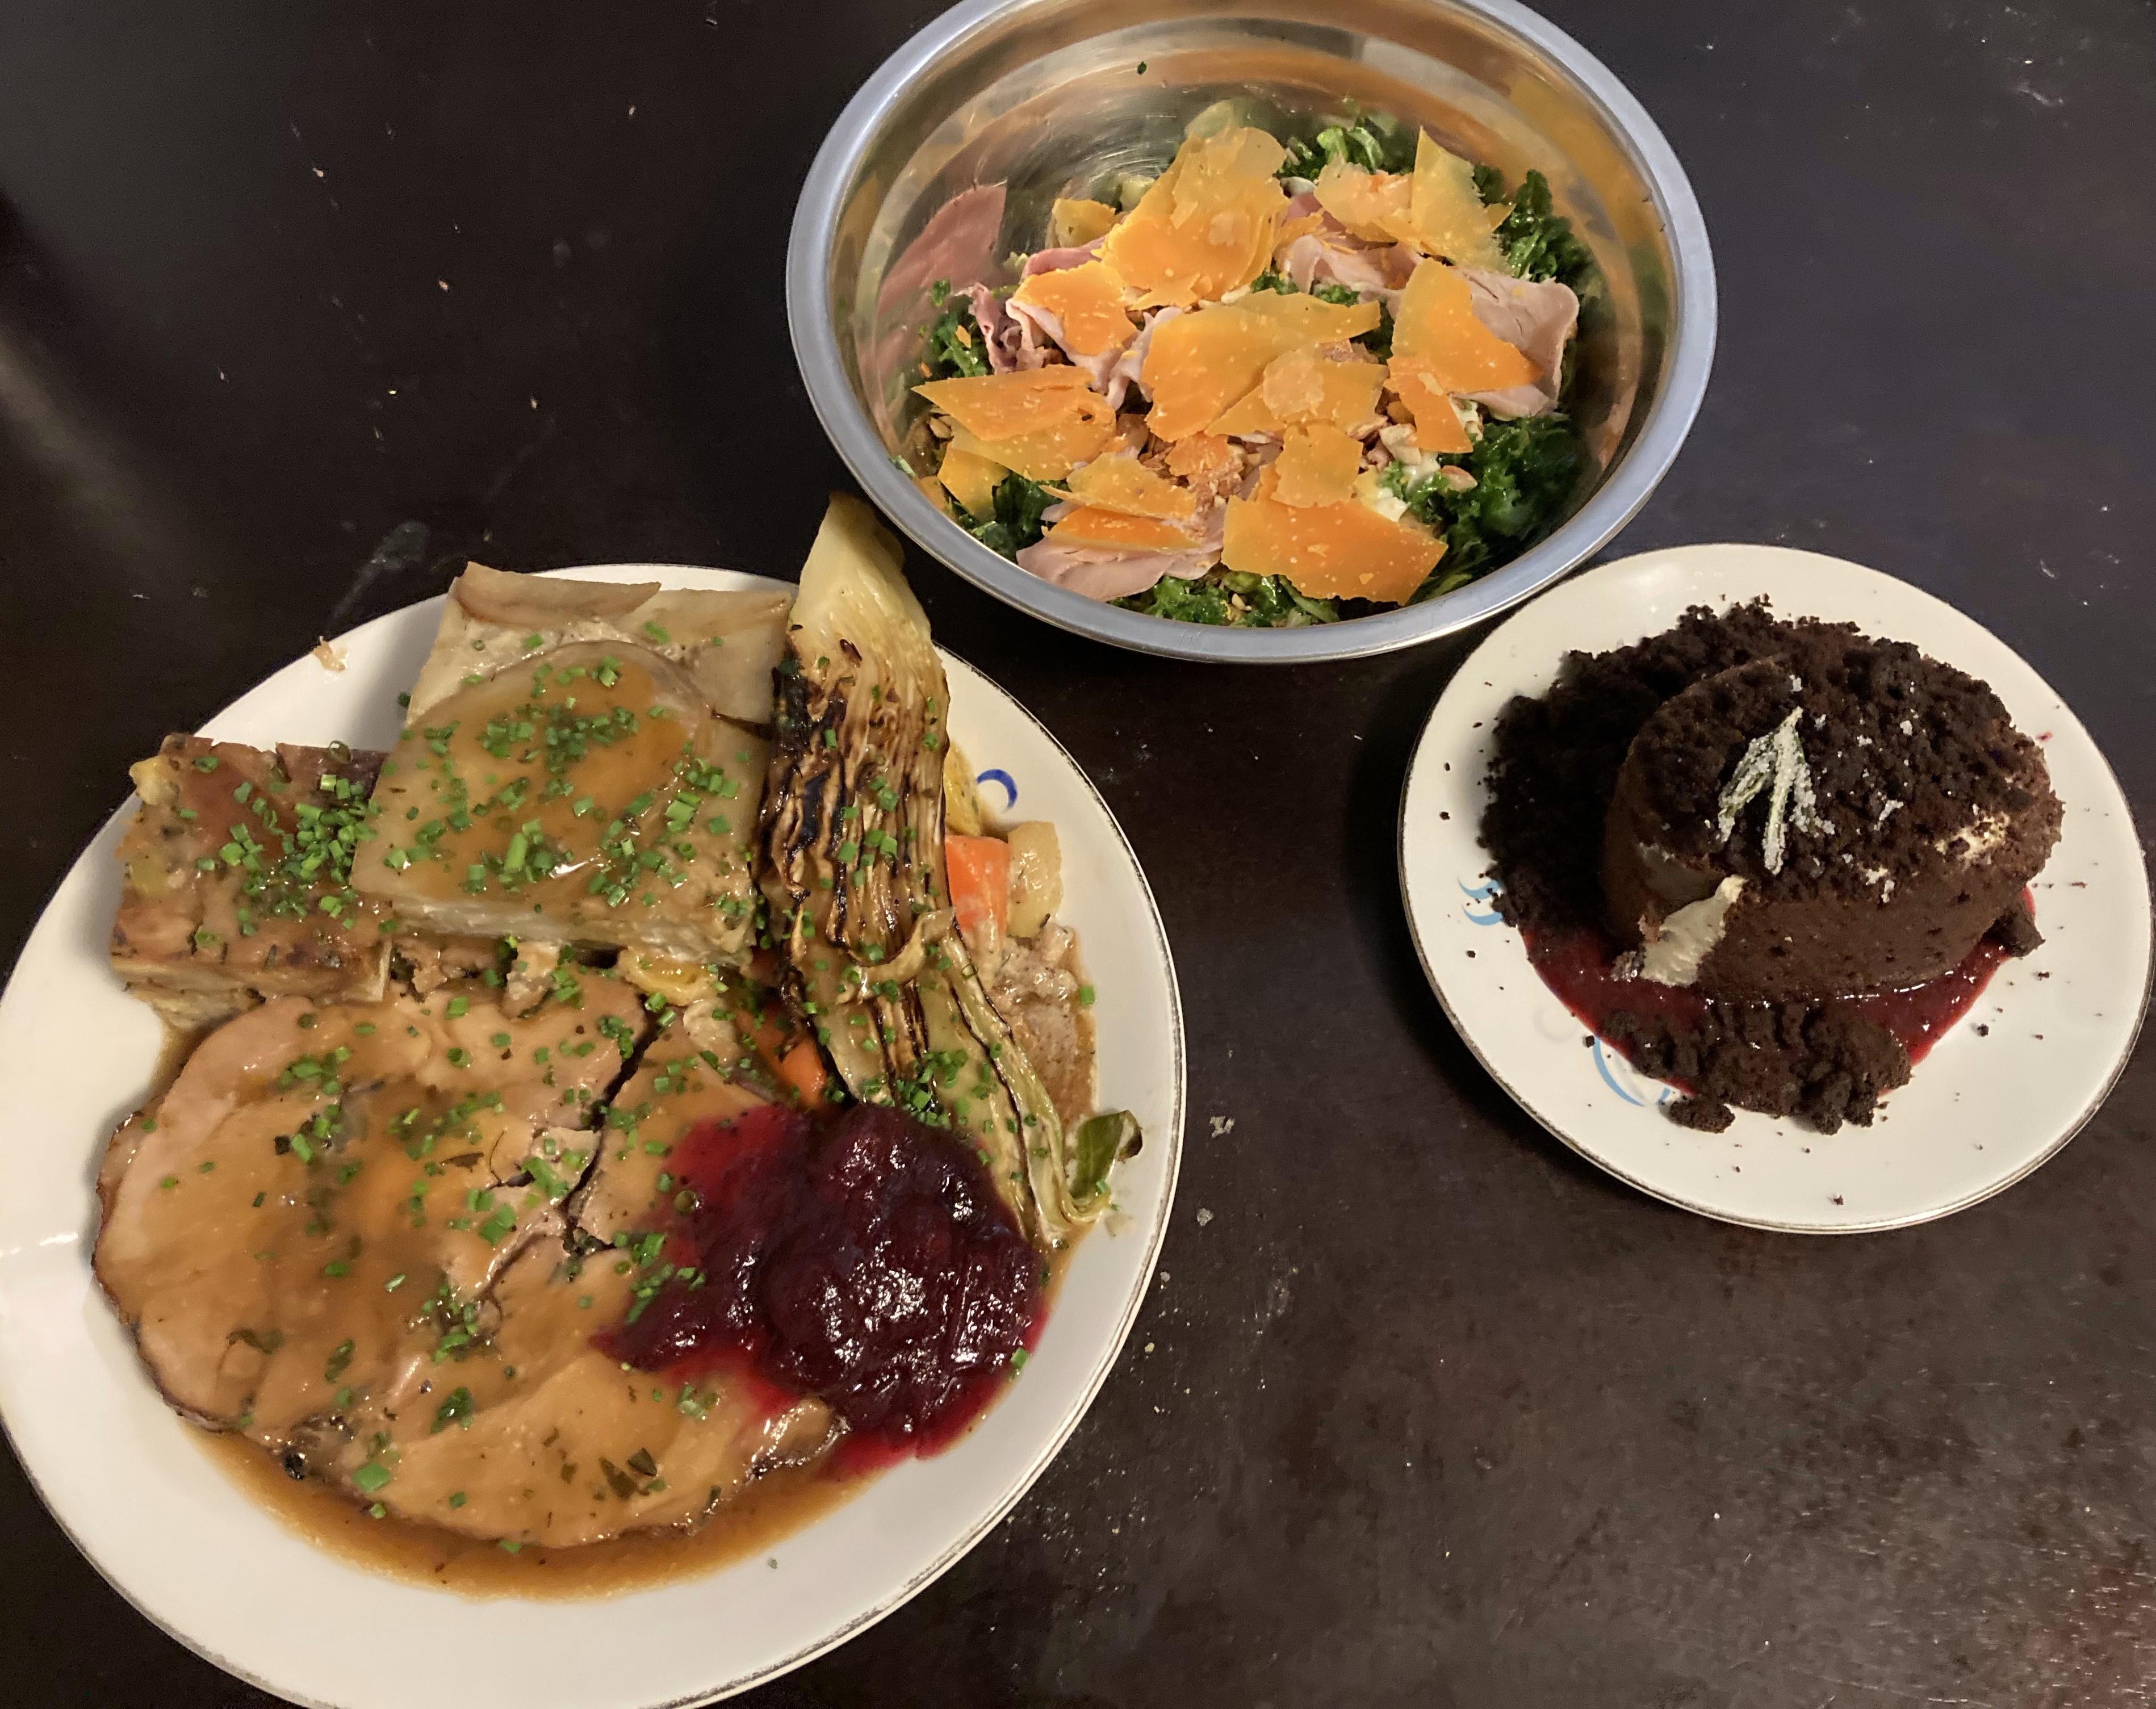 richmond_station_turducken_feast (25)